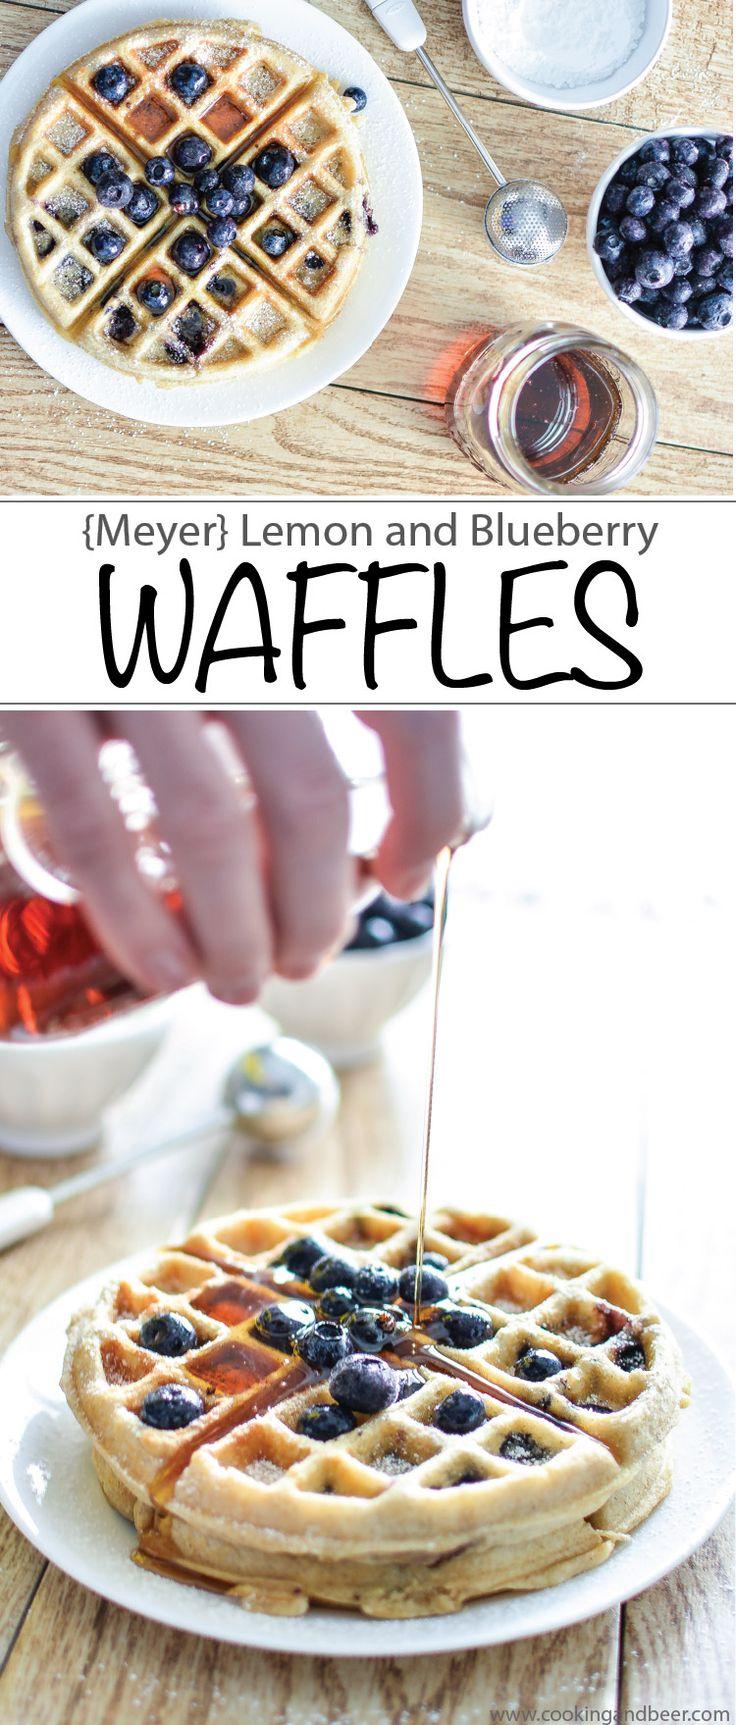 (Meyer) Lemon and Blueberry Waffles - The perfect recipe for breakfast, brunch or breakfast for dinner!